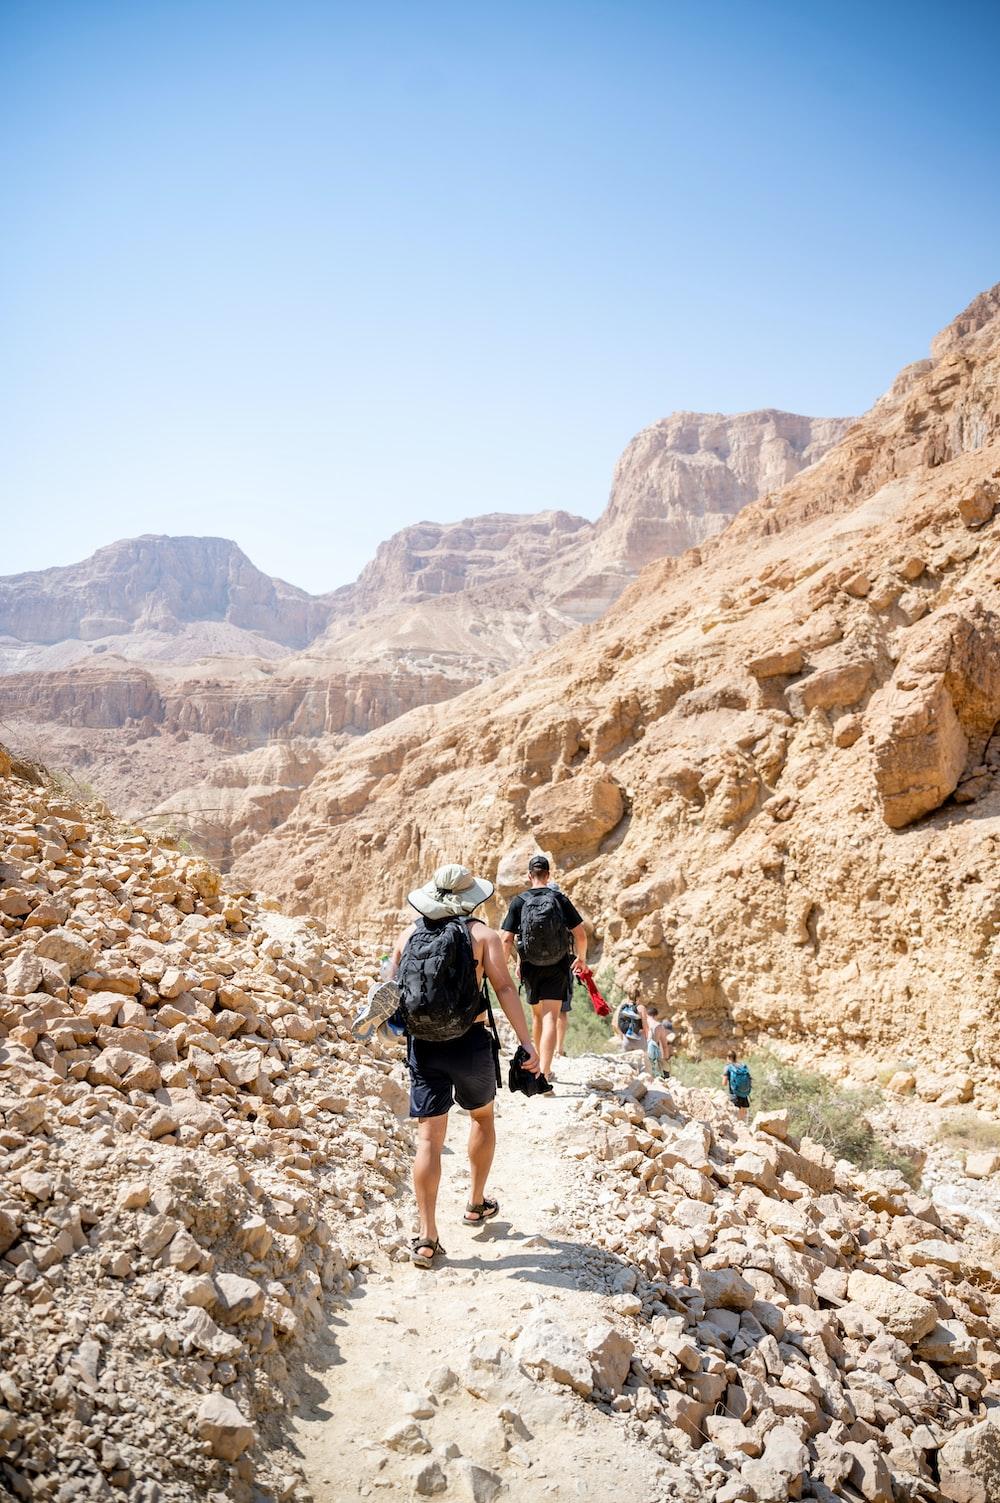 man in black t-shirt and black shorts walking on rocky mountain during daytime